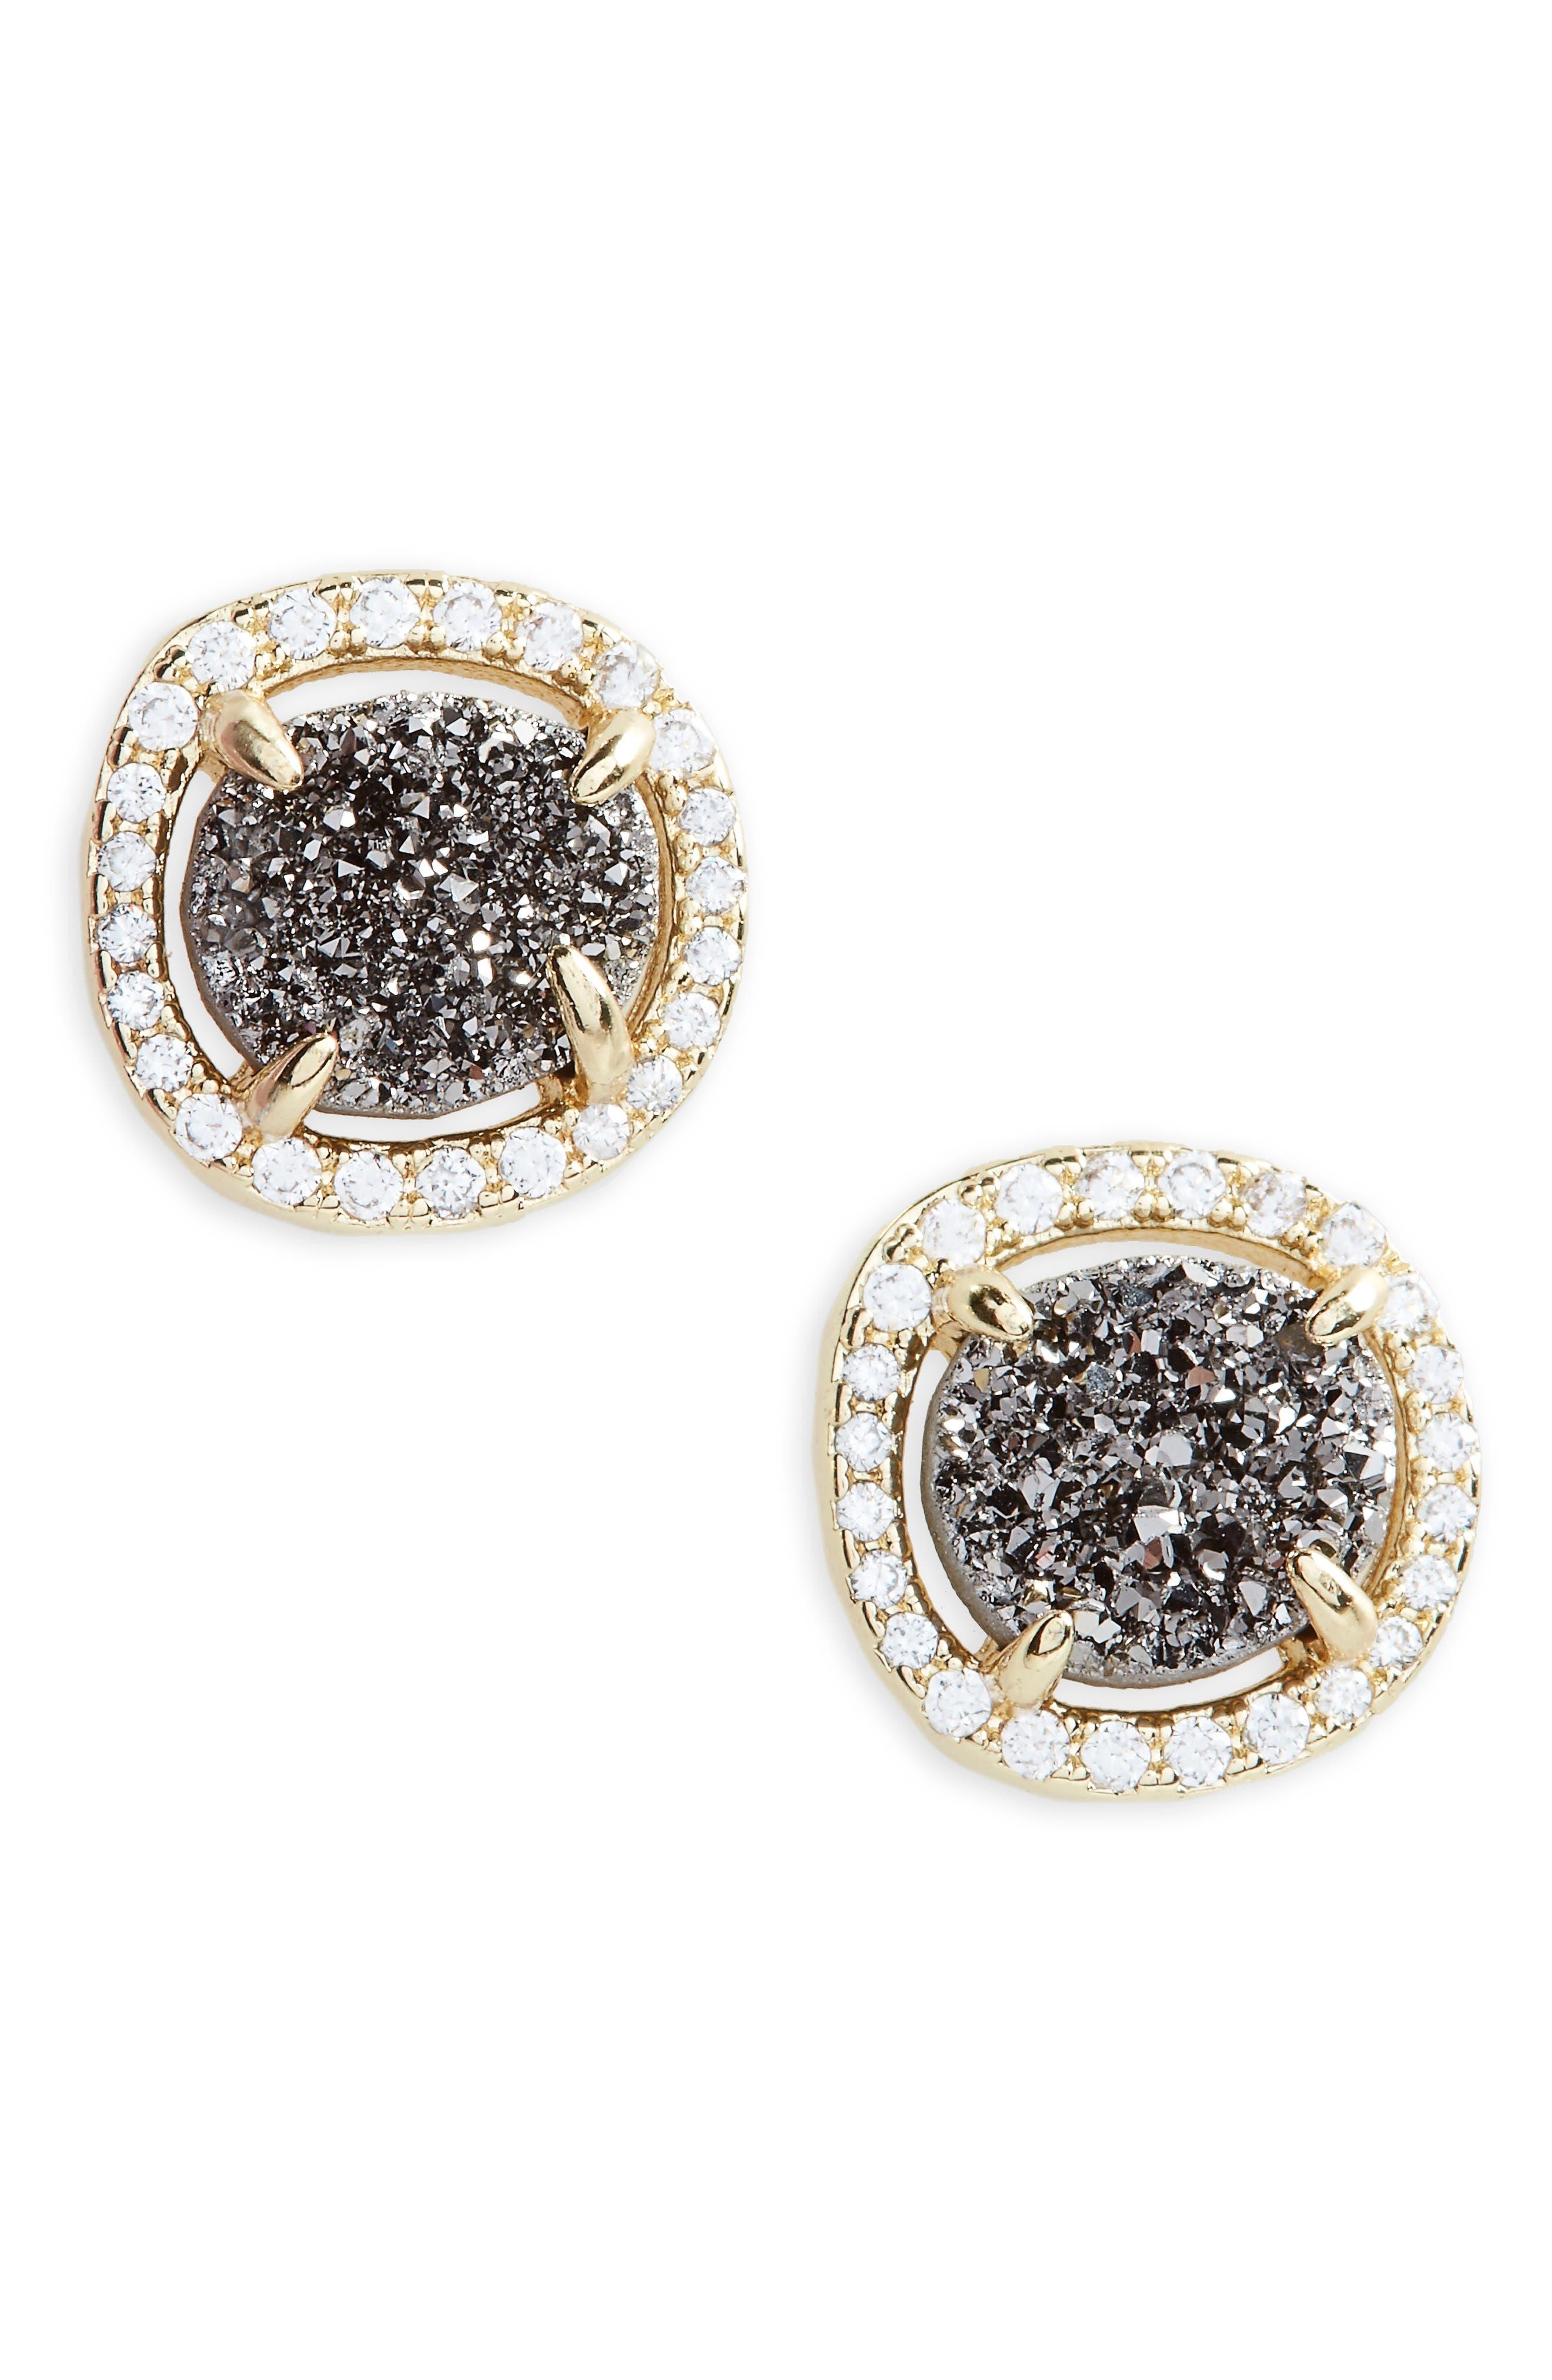 Sarah Louise Drusy Stud Earrings,                         Main,                         color, Grey Druzy/ Gold